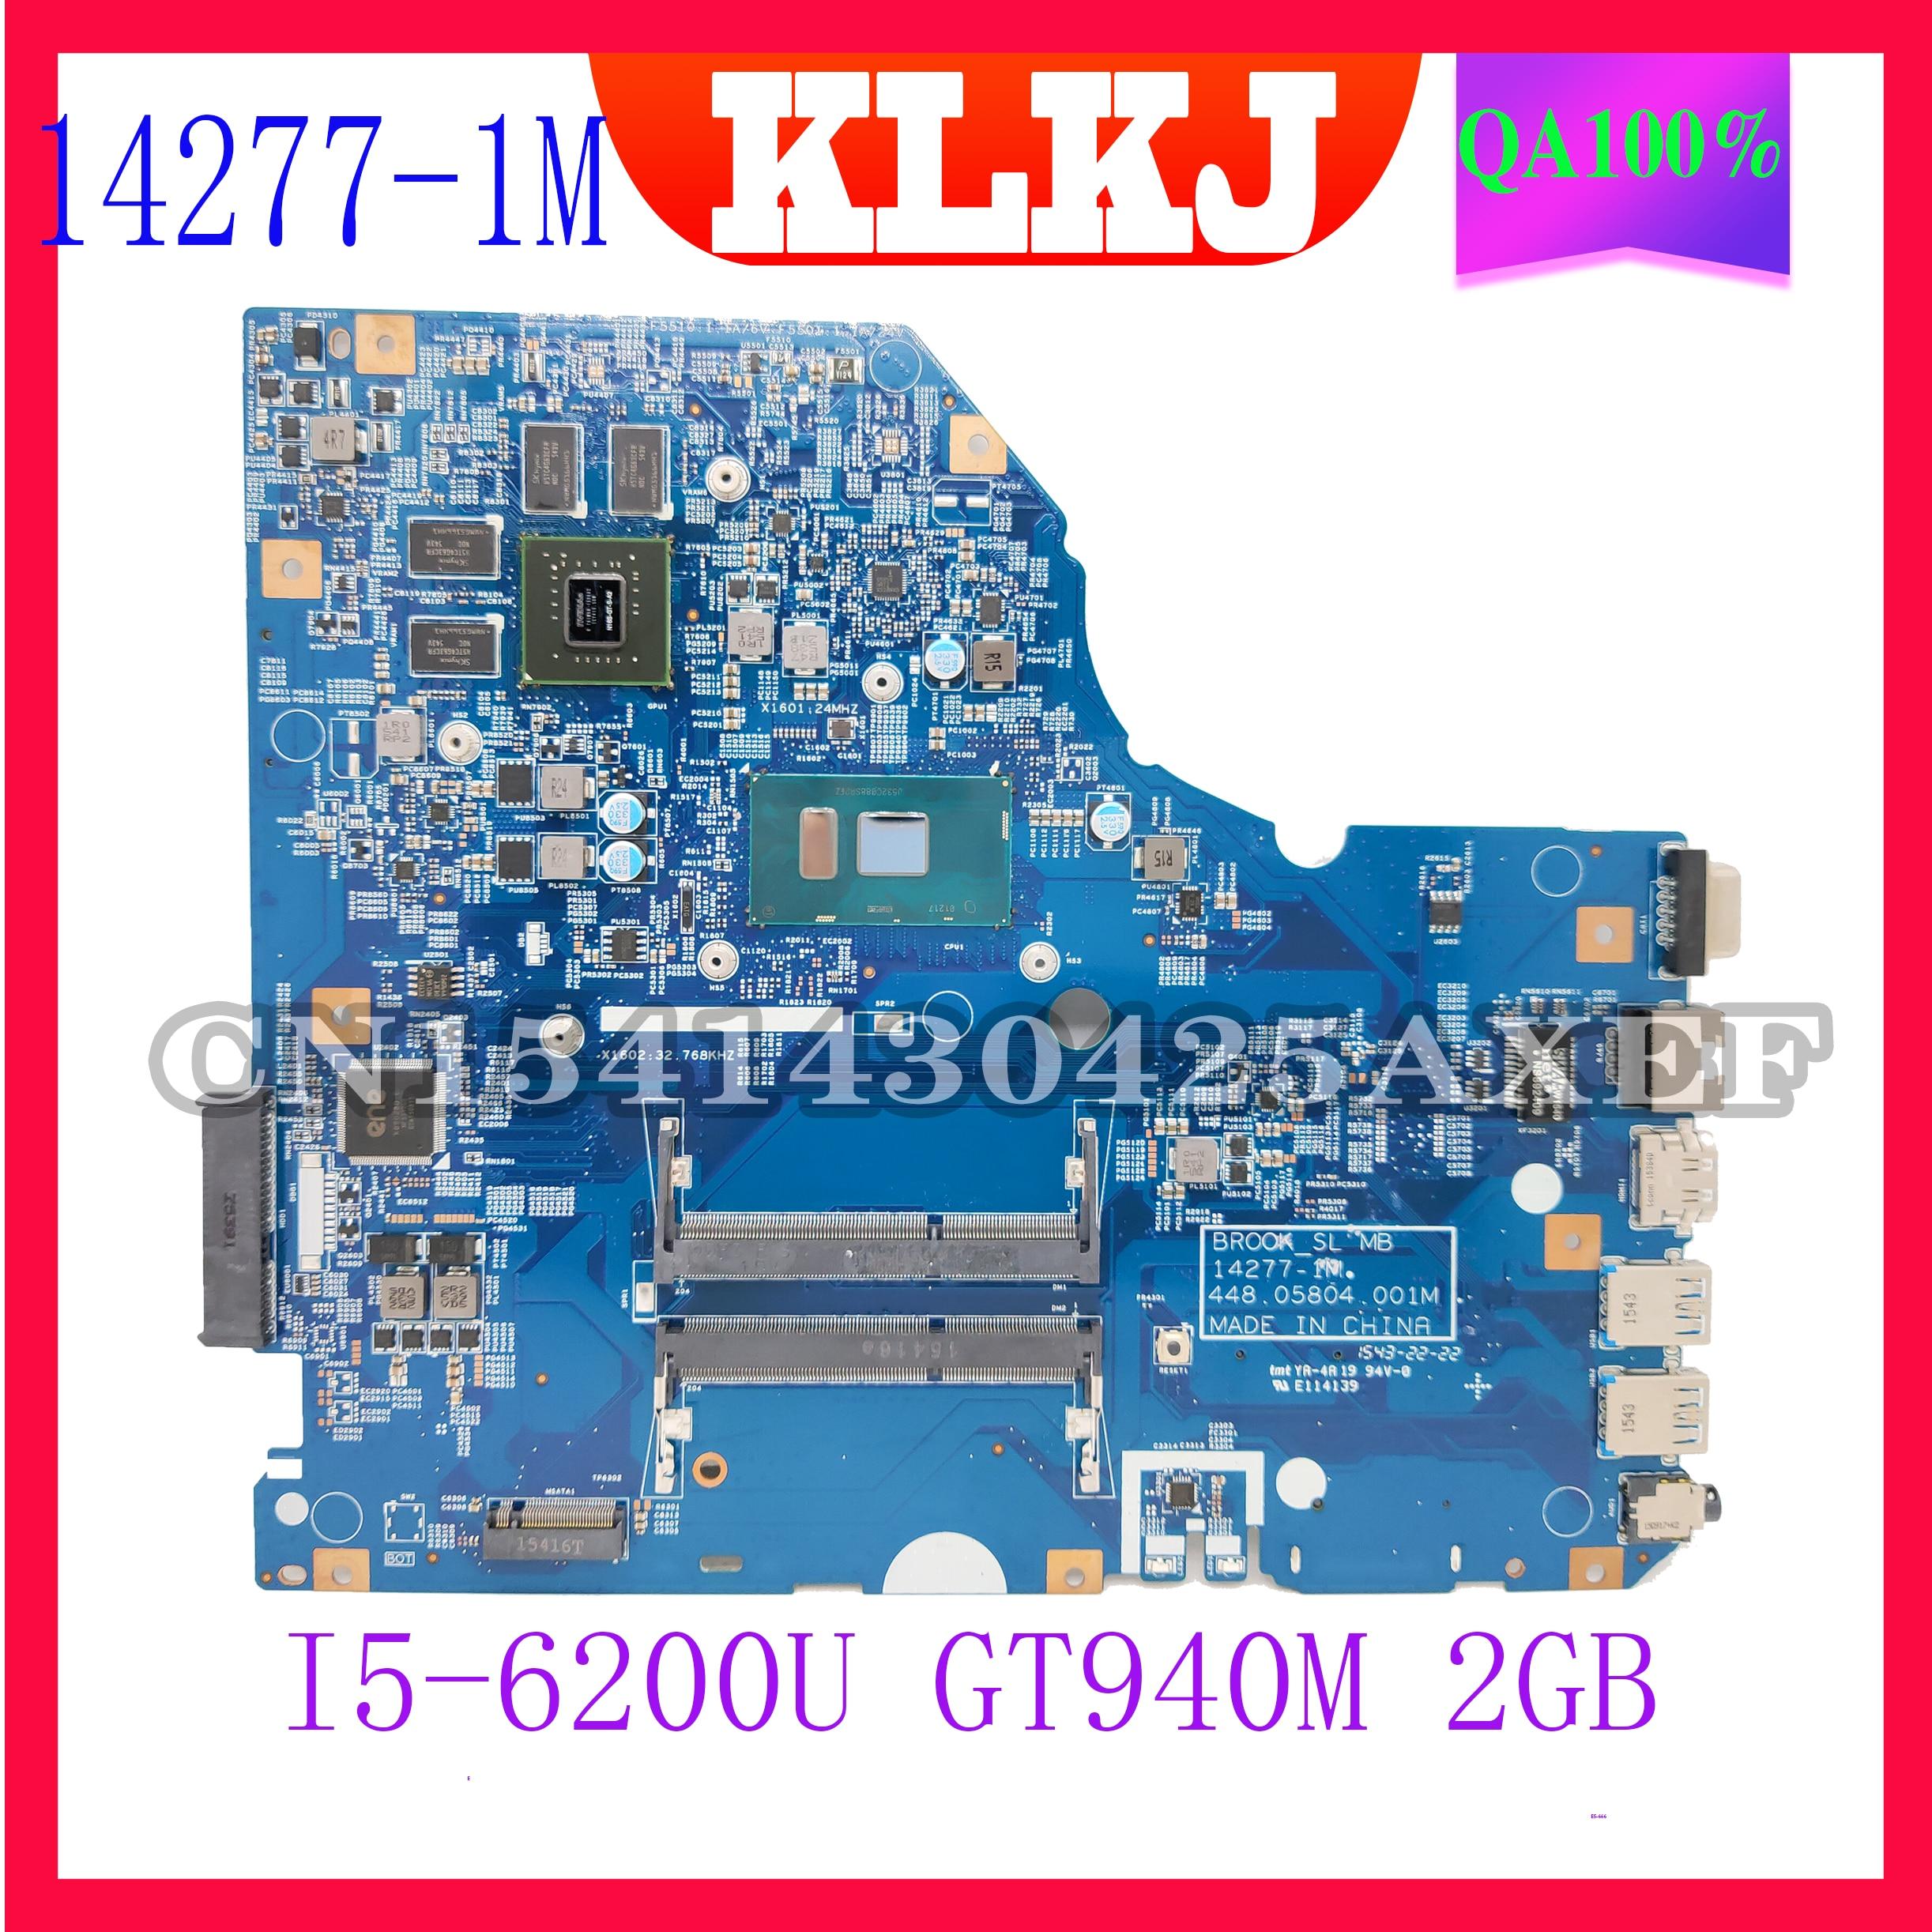 Dinzi BROOK_SL 14277-1M الأصلي اللوحة مناسبة ل أيسر E5-773G E5-773 دفتر اللوحة I5-6200U GT940M-2GB